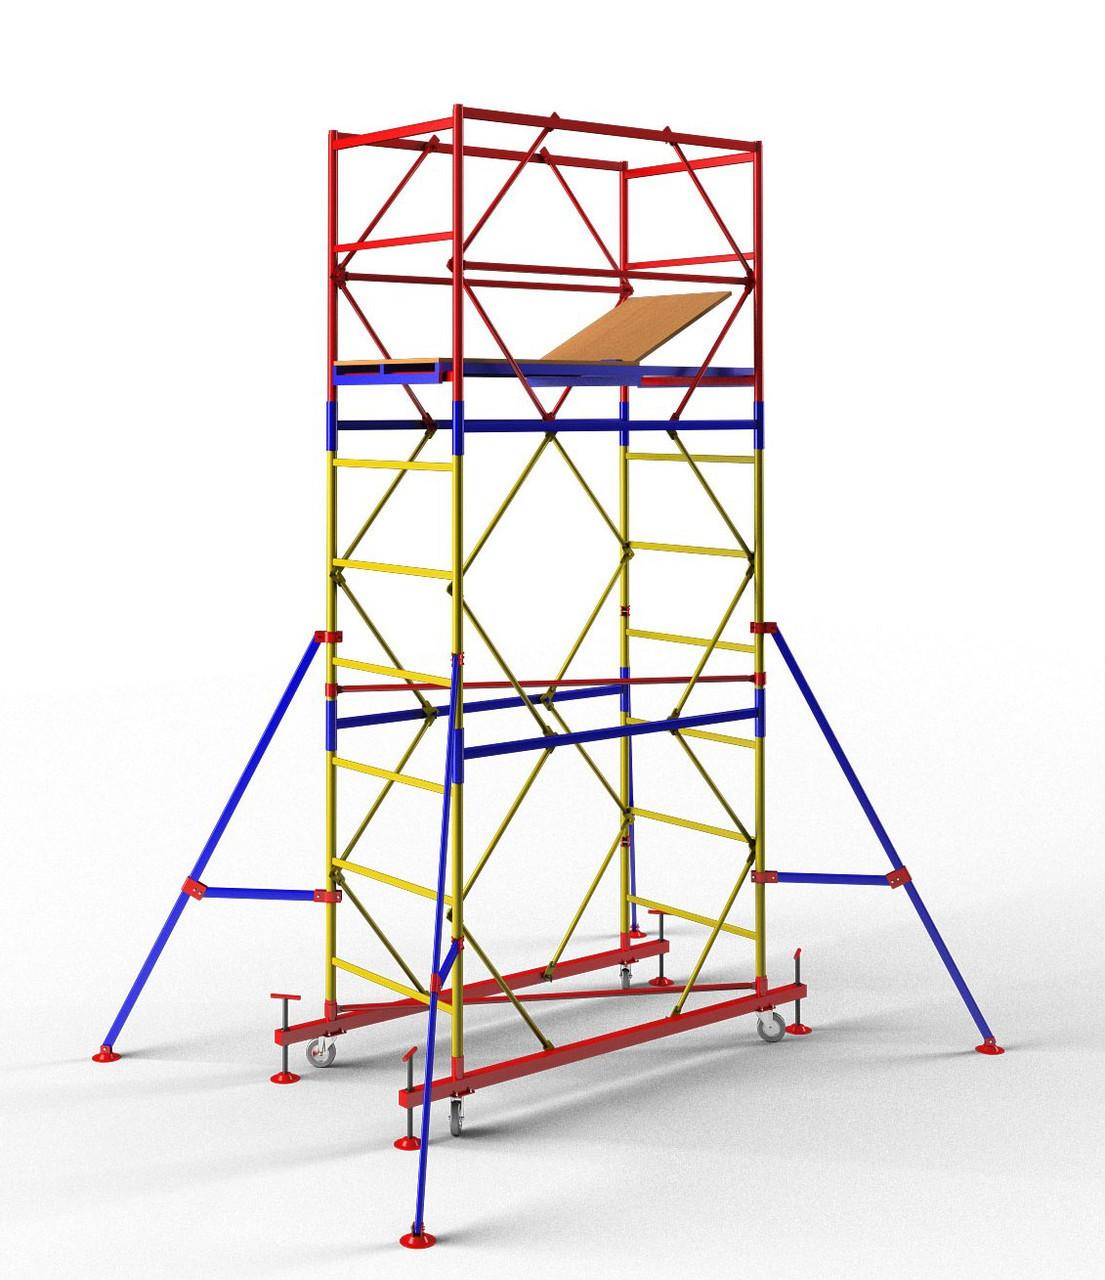 Вышка-тура мобильная облегченная 1,2 х 2,0 м (14+1) Раб.высота 19,4 м